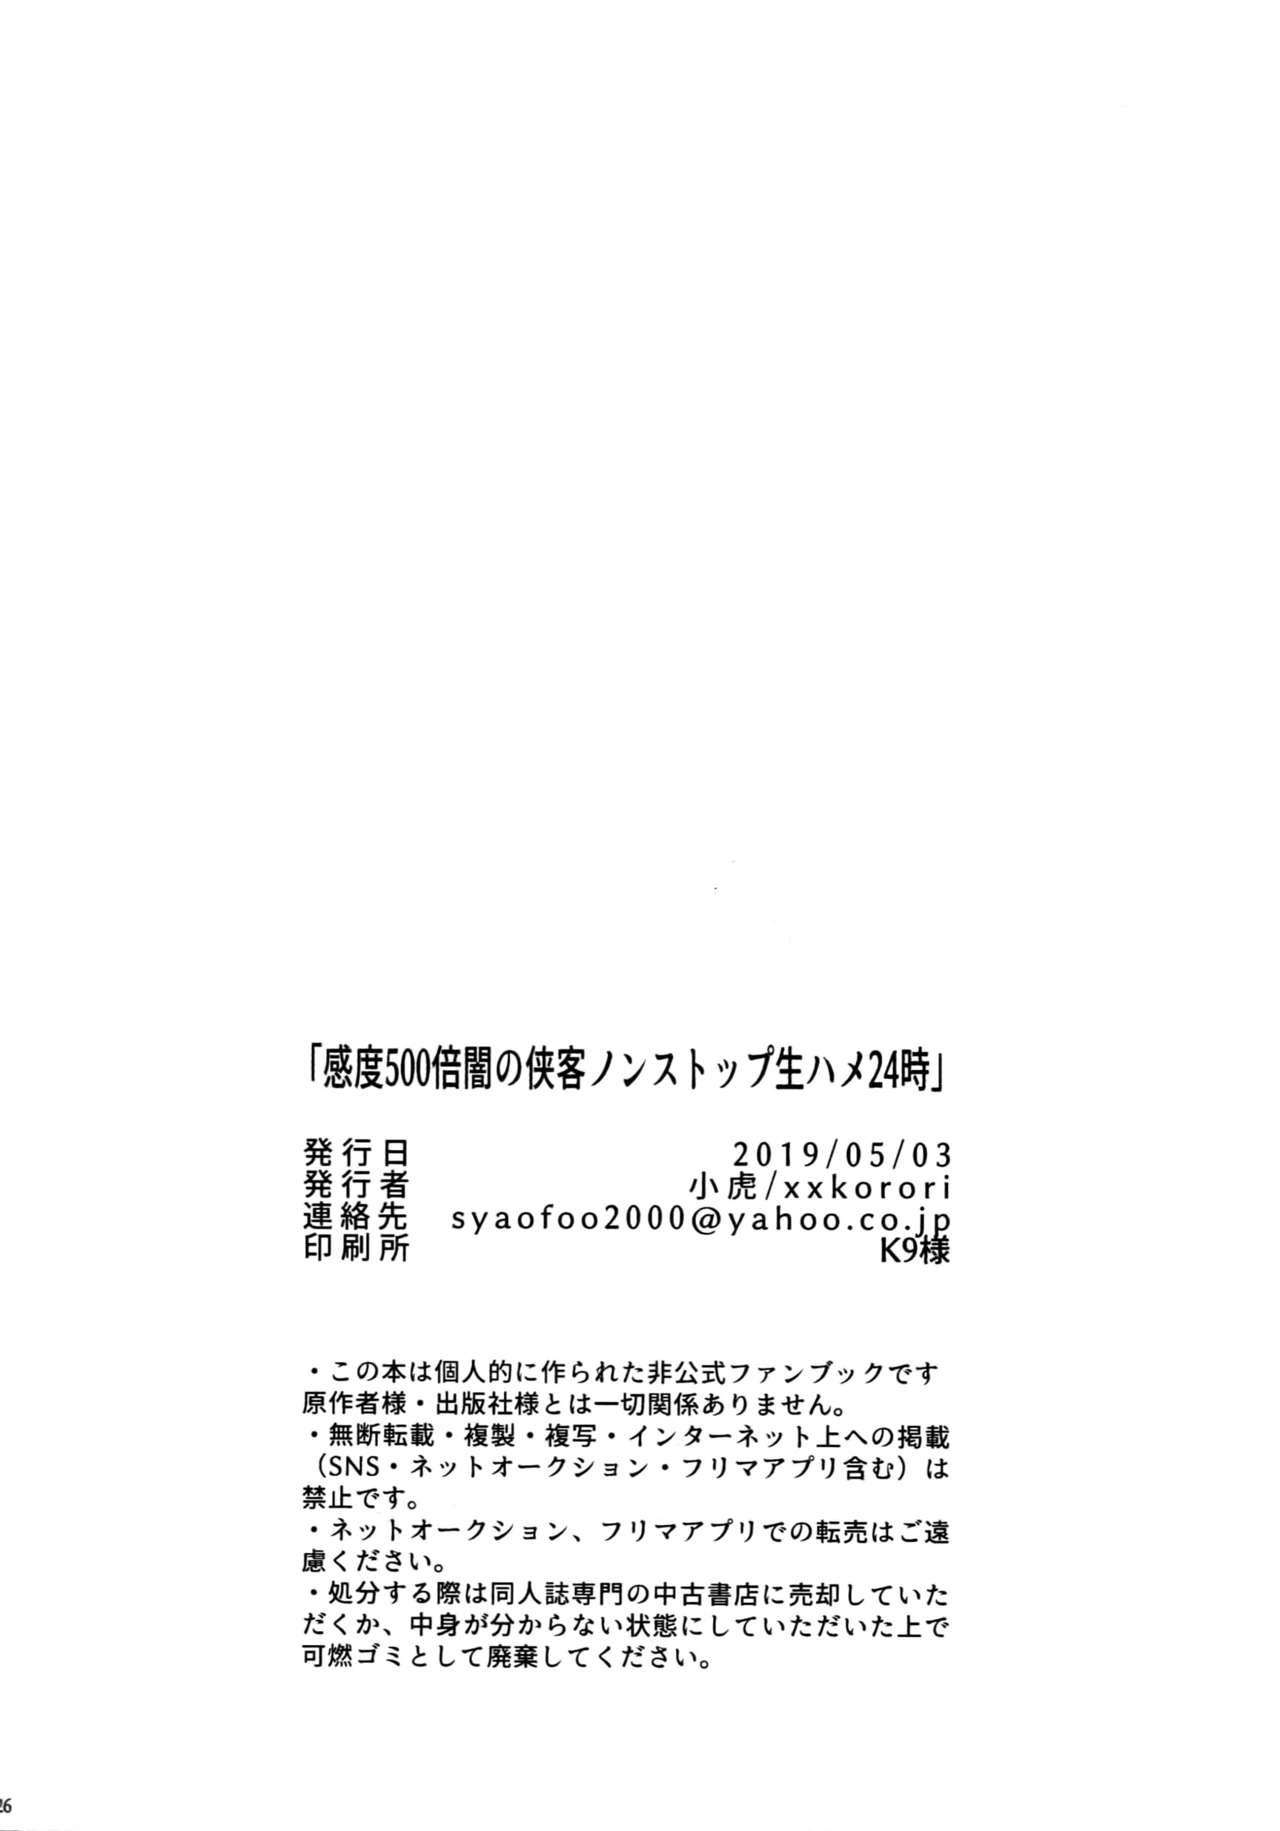 (Super ROOT 4 to 5 2019) [xxkorori (Ko Tora)] Kando 500-bai Yami no Kyoukaku Nonstop Namahame 24-ji | 500-times Enhanced 24-hour Nonstop Raw Sex Session with the Guest of Darkness (Fate/Grand Order) [English] [MintVoid] 25